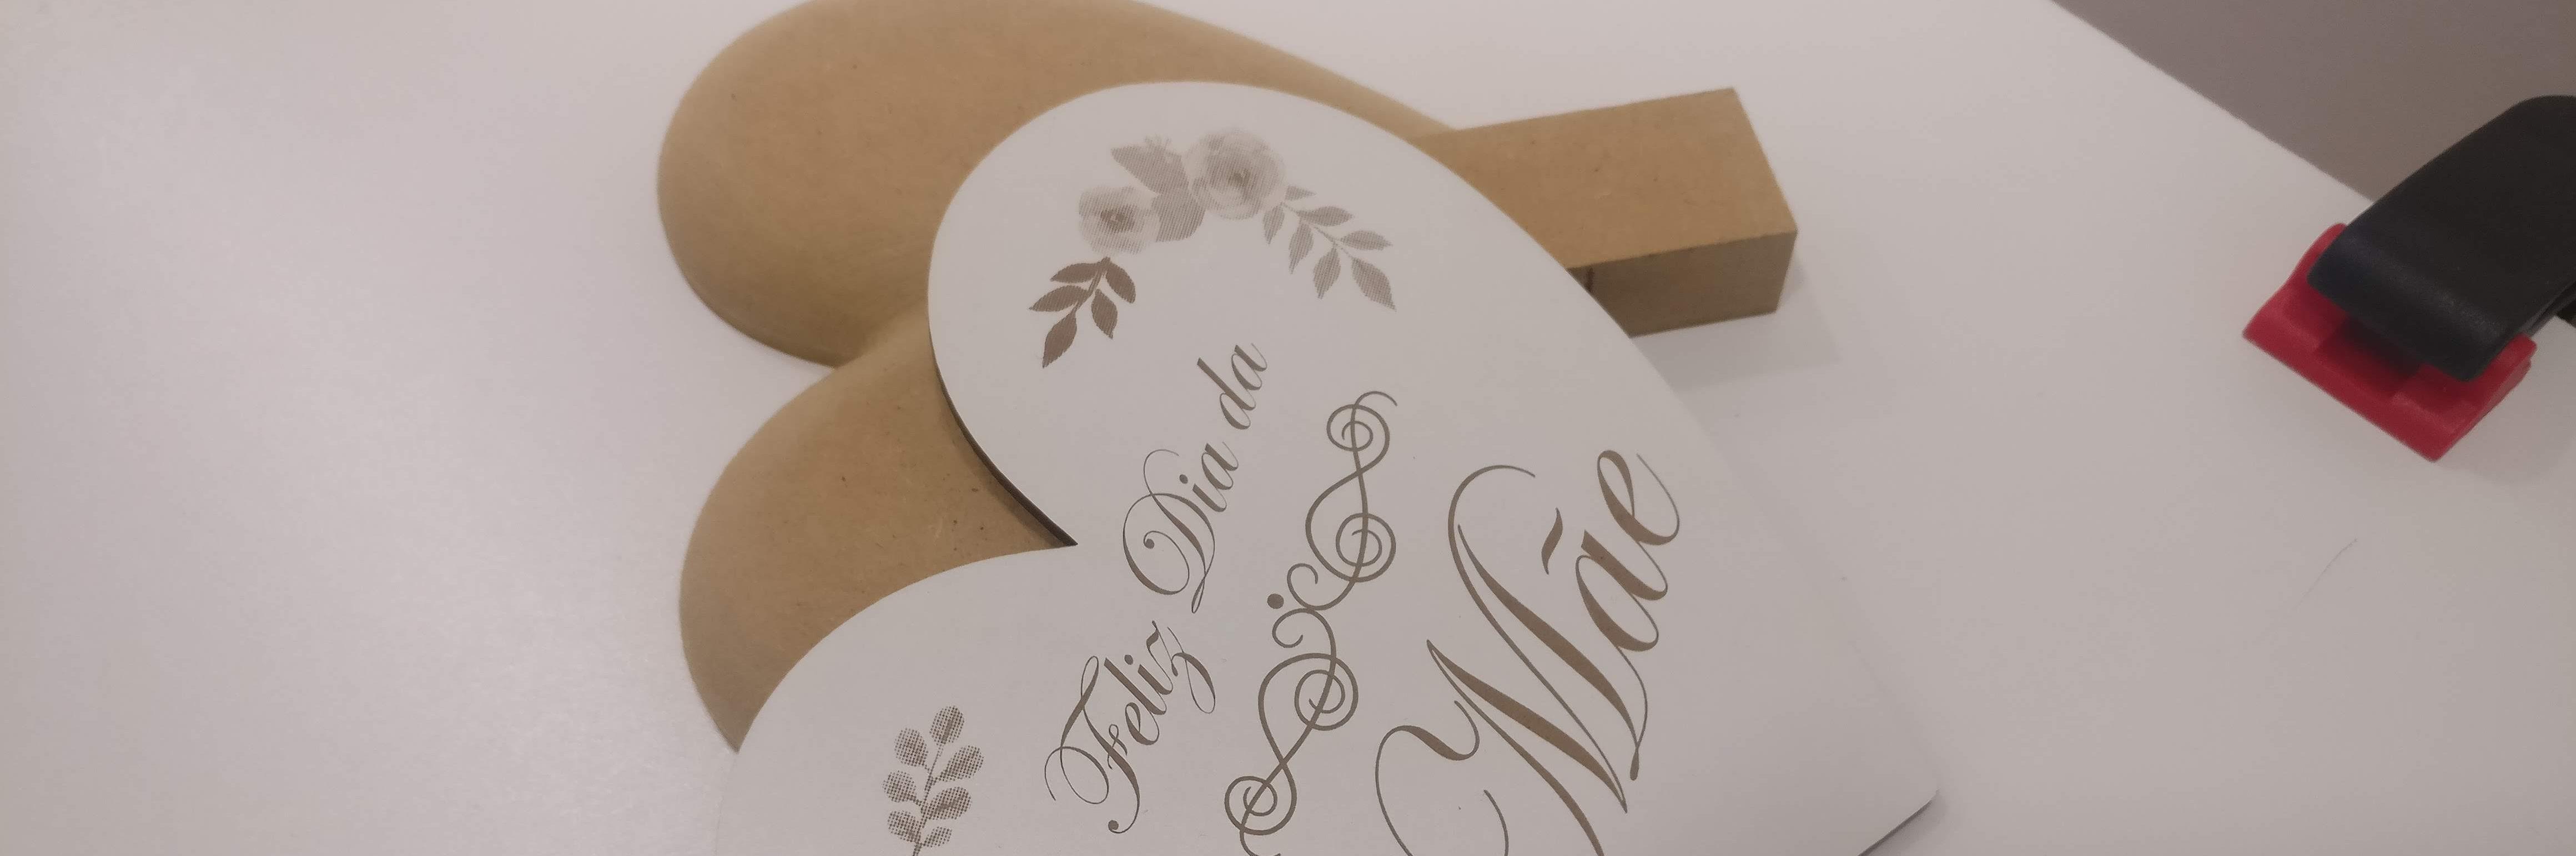 Diana Crafts & Co. VII